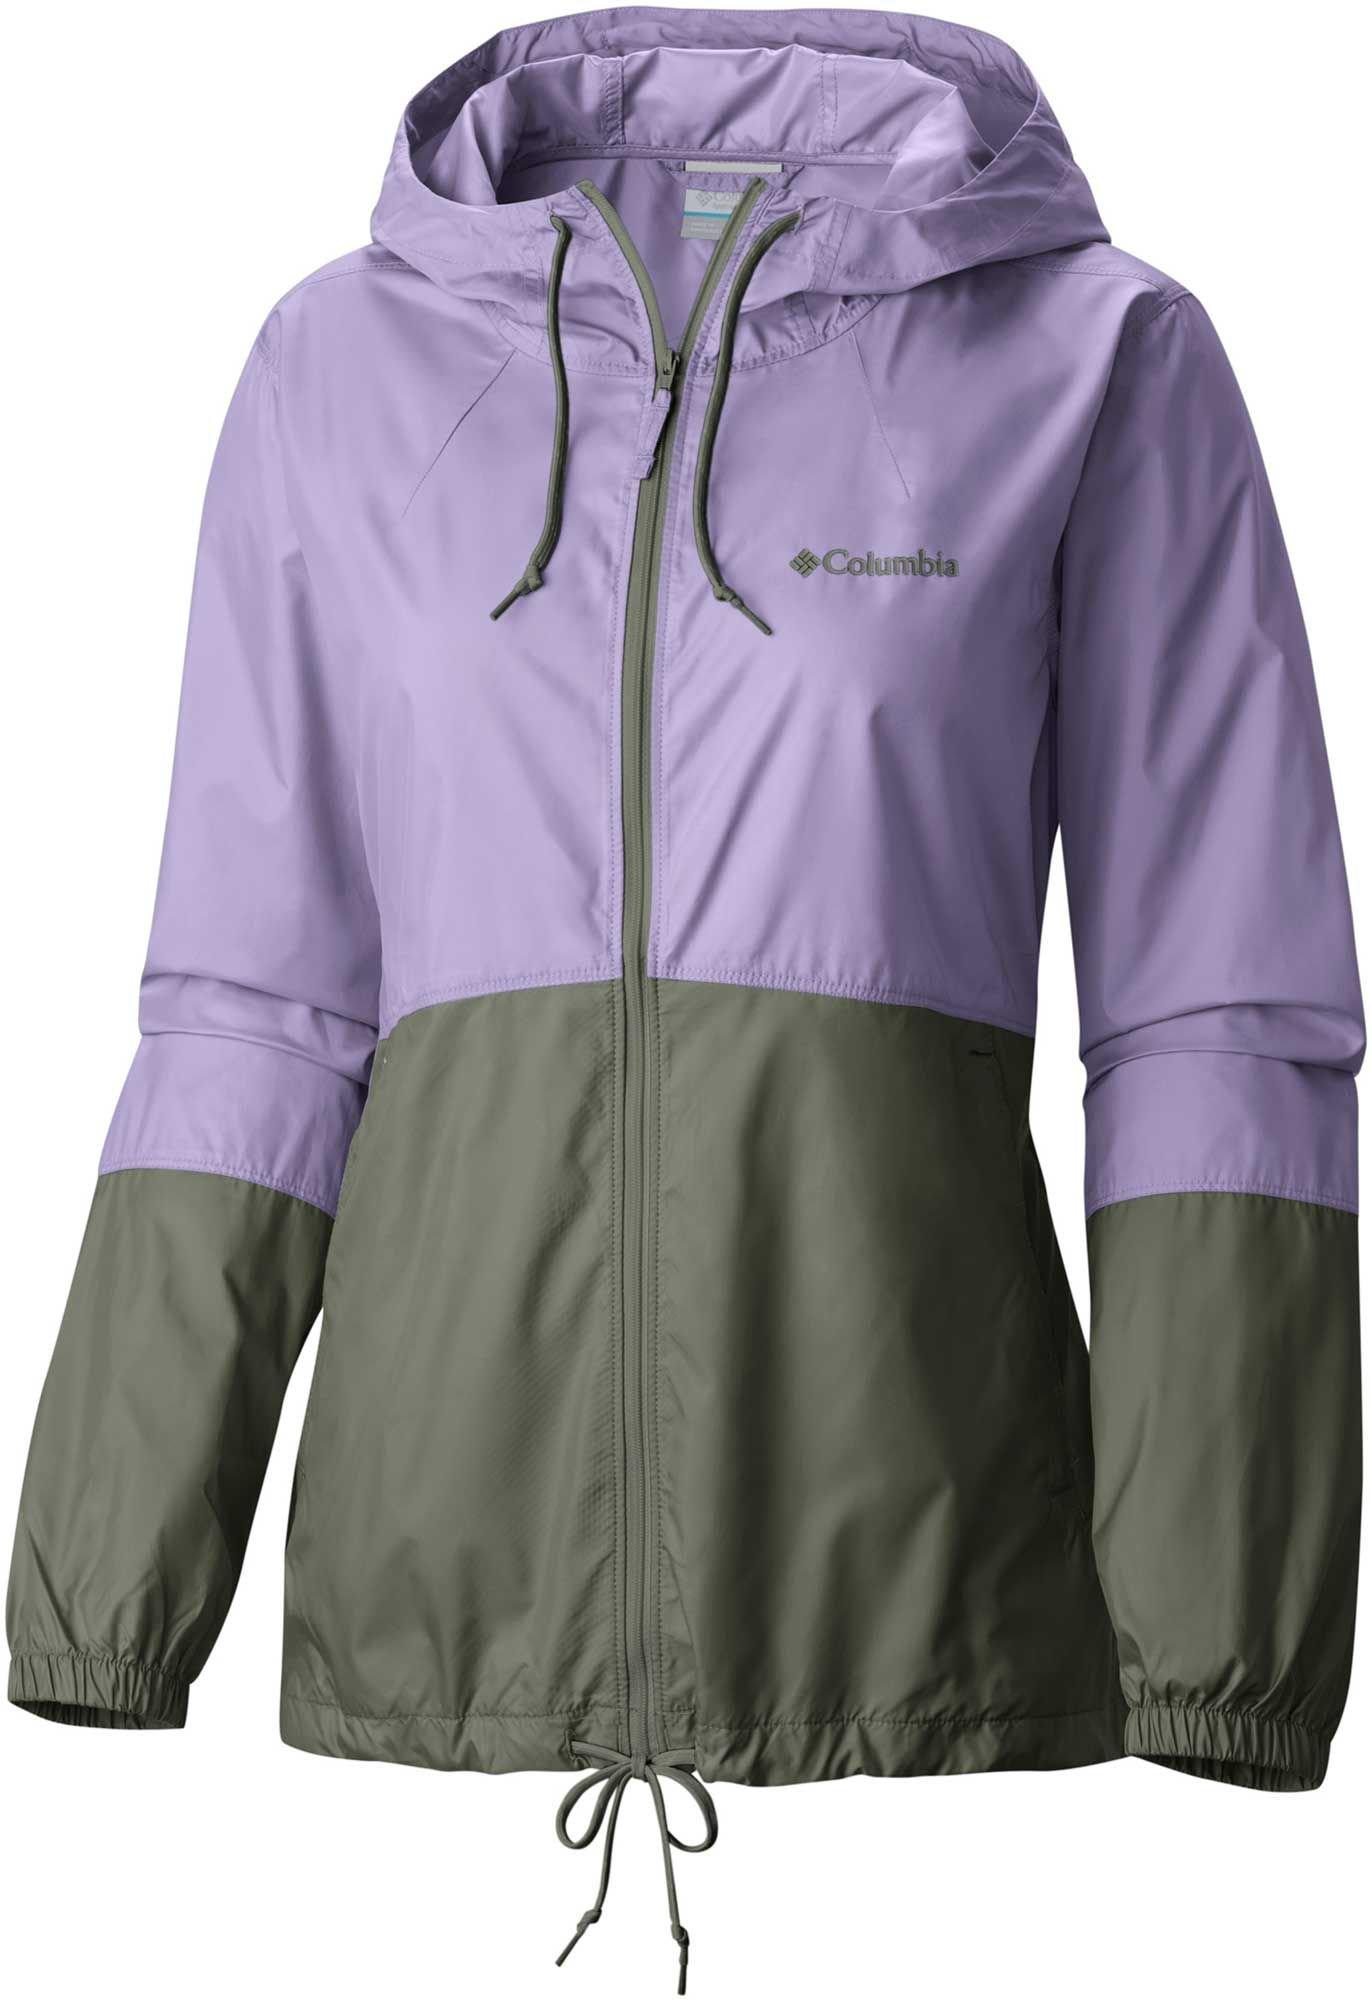 Columbia Women's Plus Size Flash Forward Windbreaker Jacket, Soft Violet, Cypress, 1X